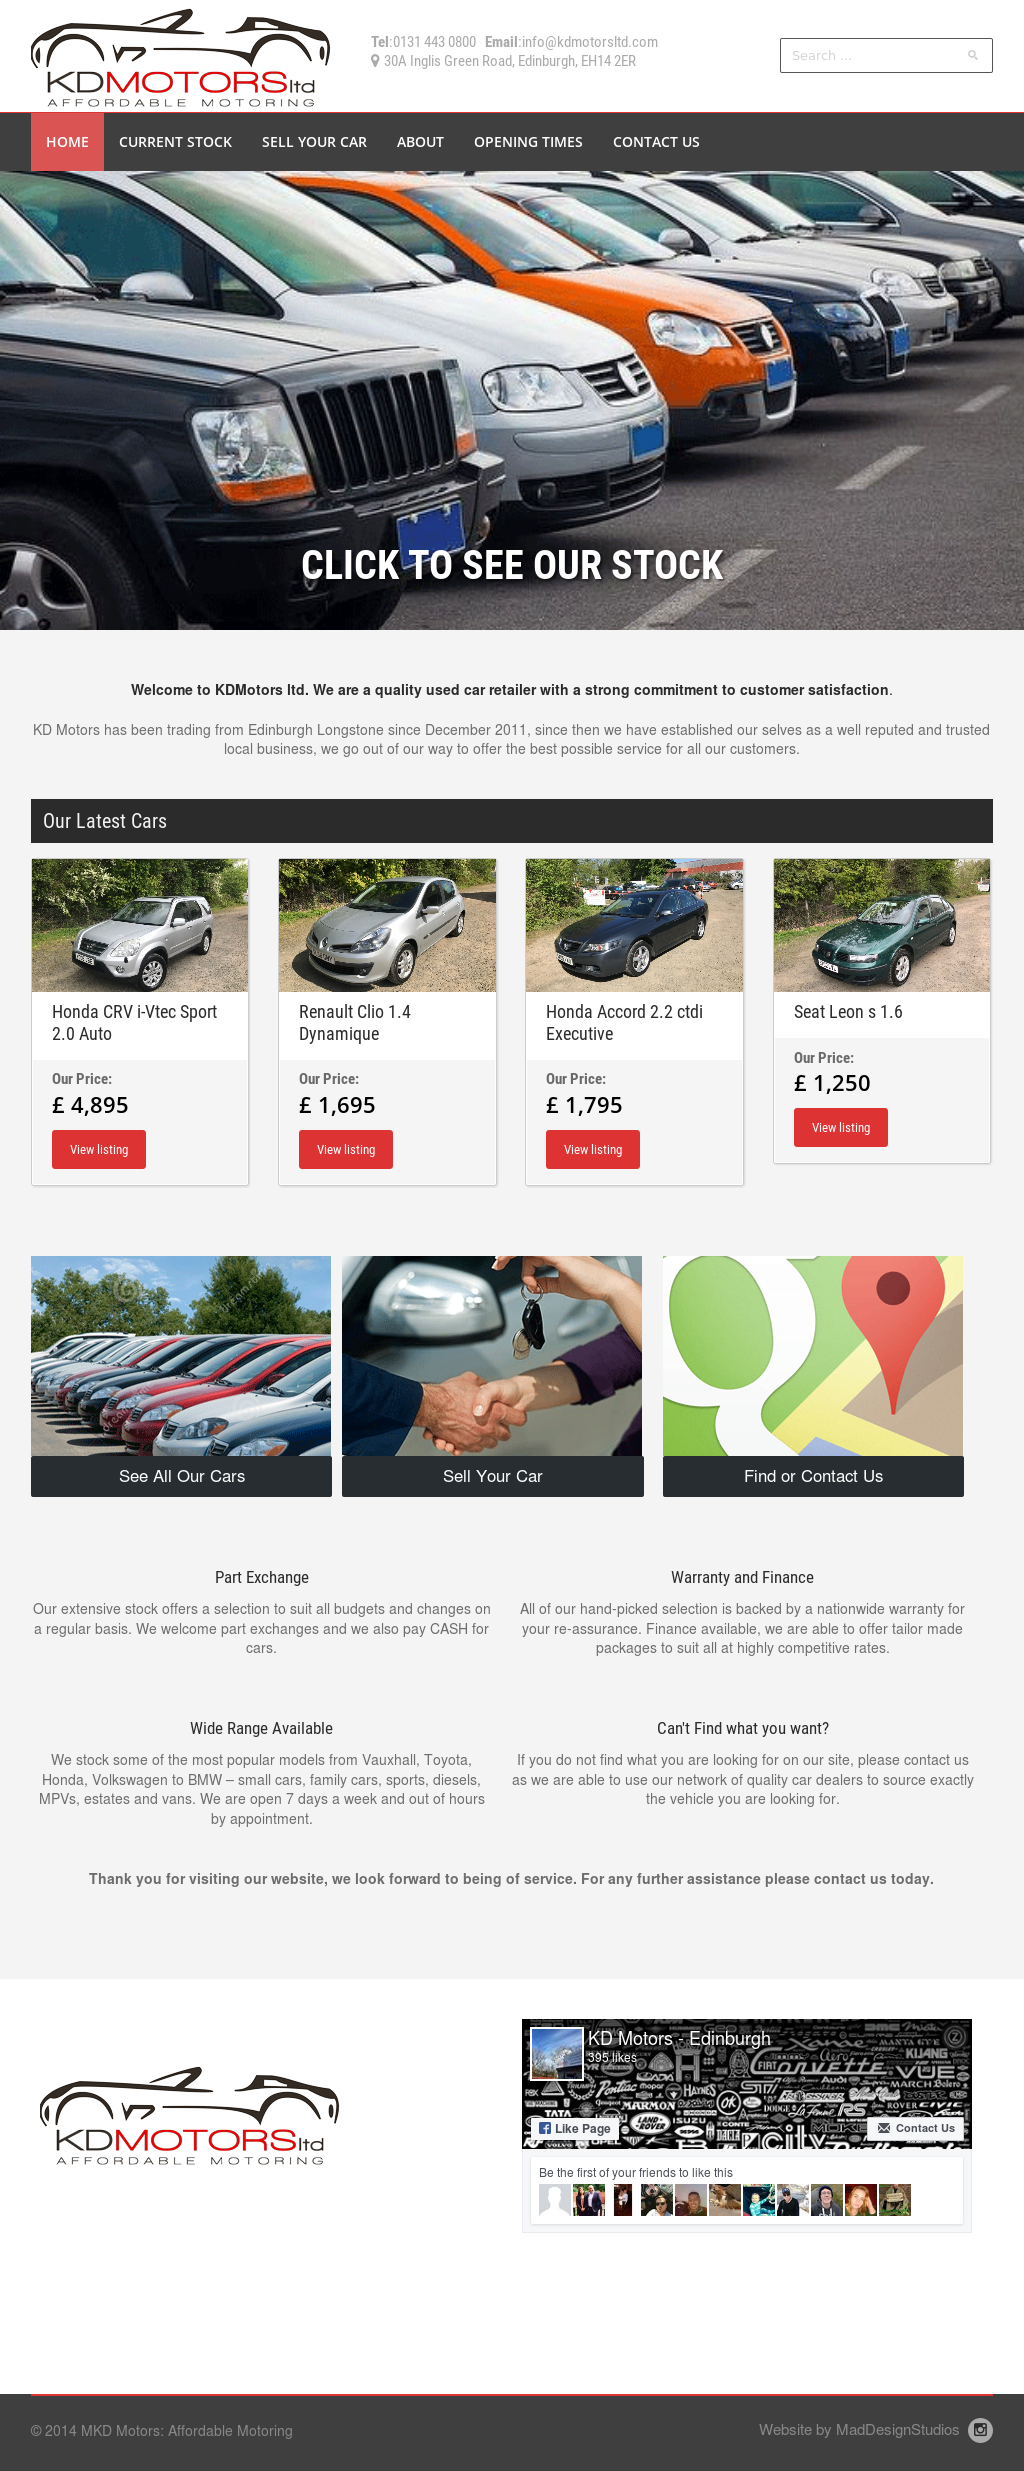 Kd Motors website history